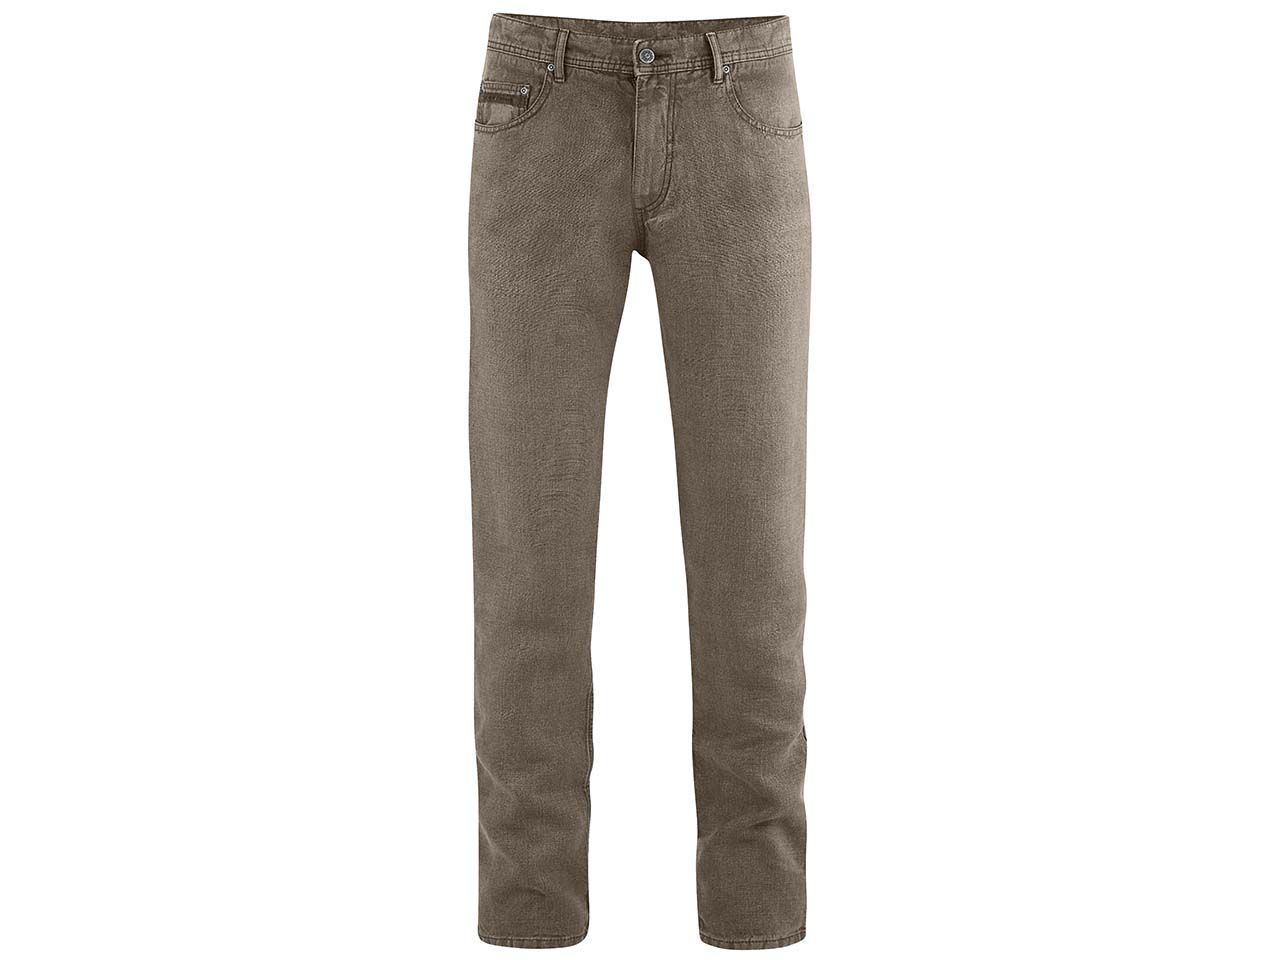 HempAge unisex-Jeans, 5-pocket, tobacco, Gr. 33/34 DH511